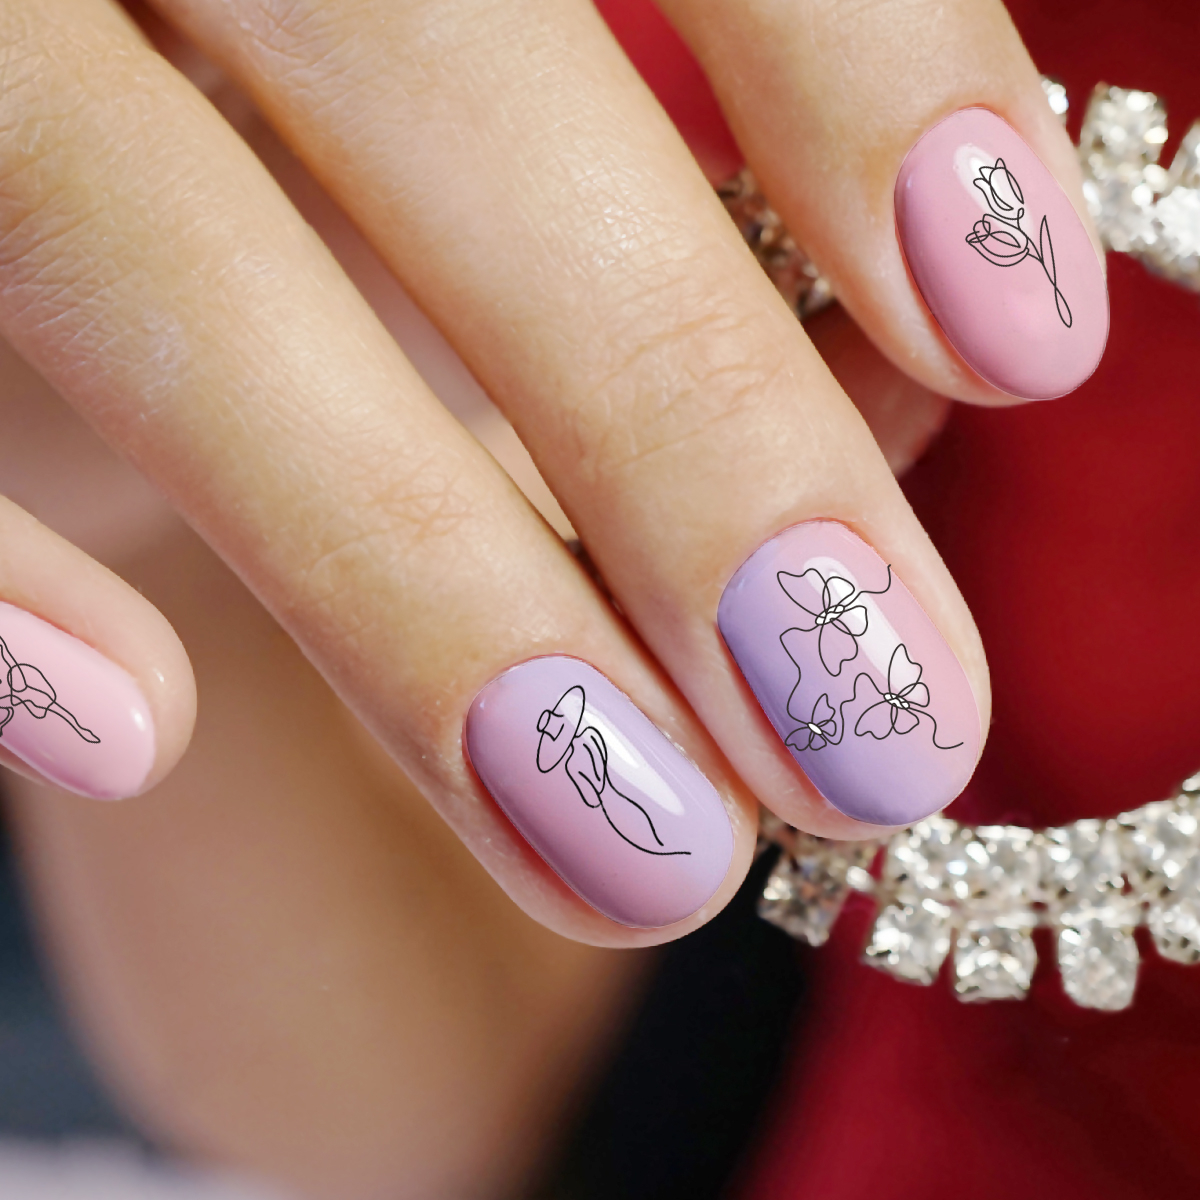 Image 5 - BEAUTYBIGBANG 6*12cm Nail Stamping Plates Nail Template Flower Animal Pattern Nail Stamp Nail Art Stamp Image Template-in Nail Art Templates from Beauty & Health